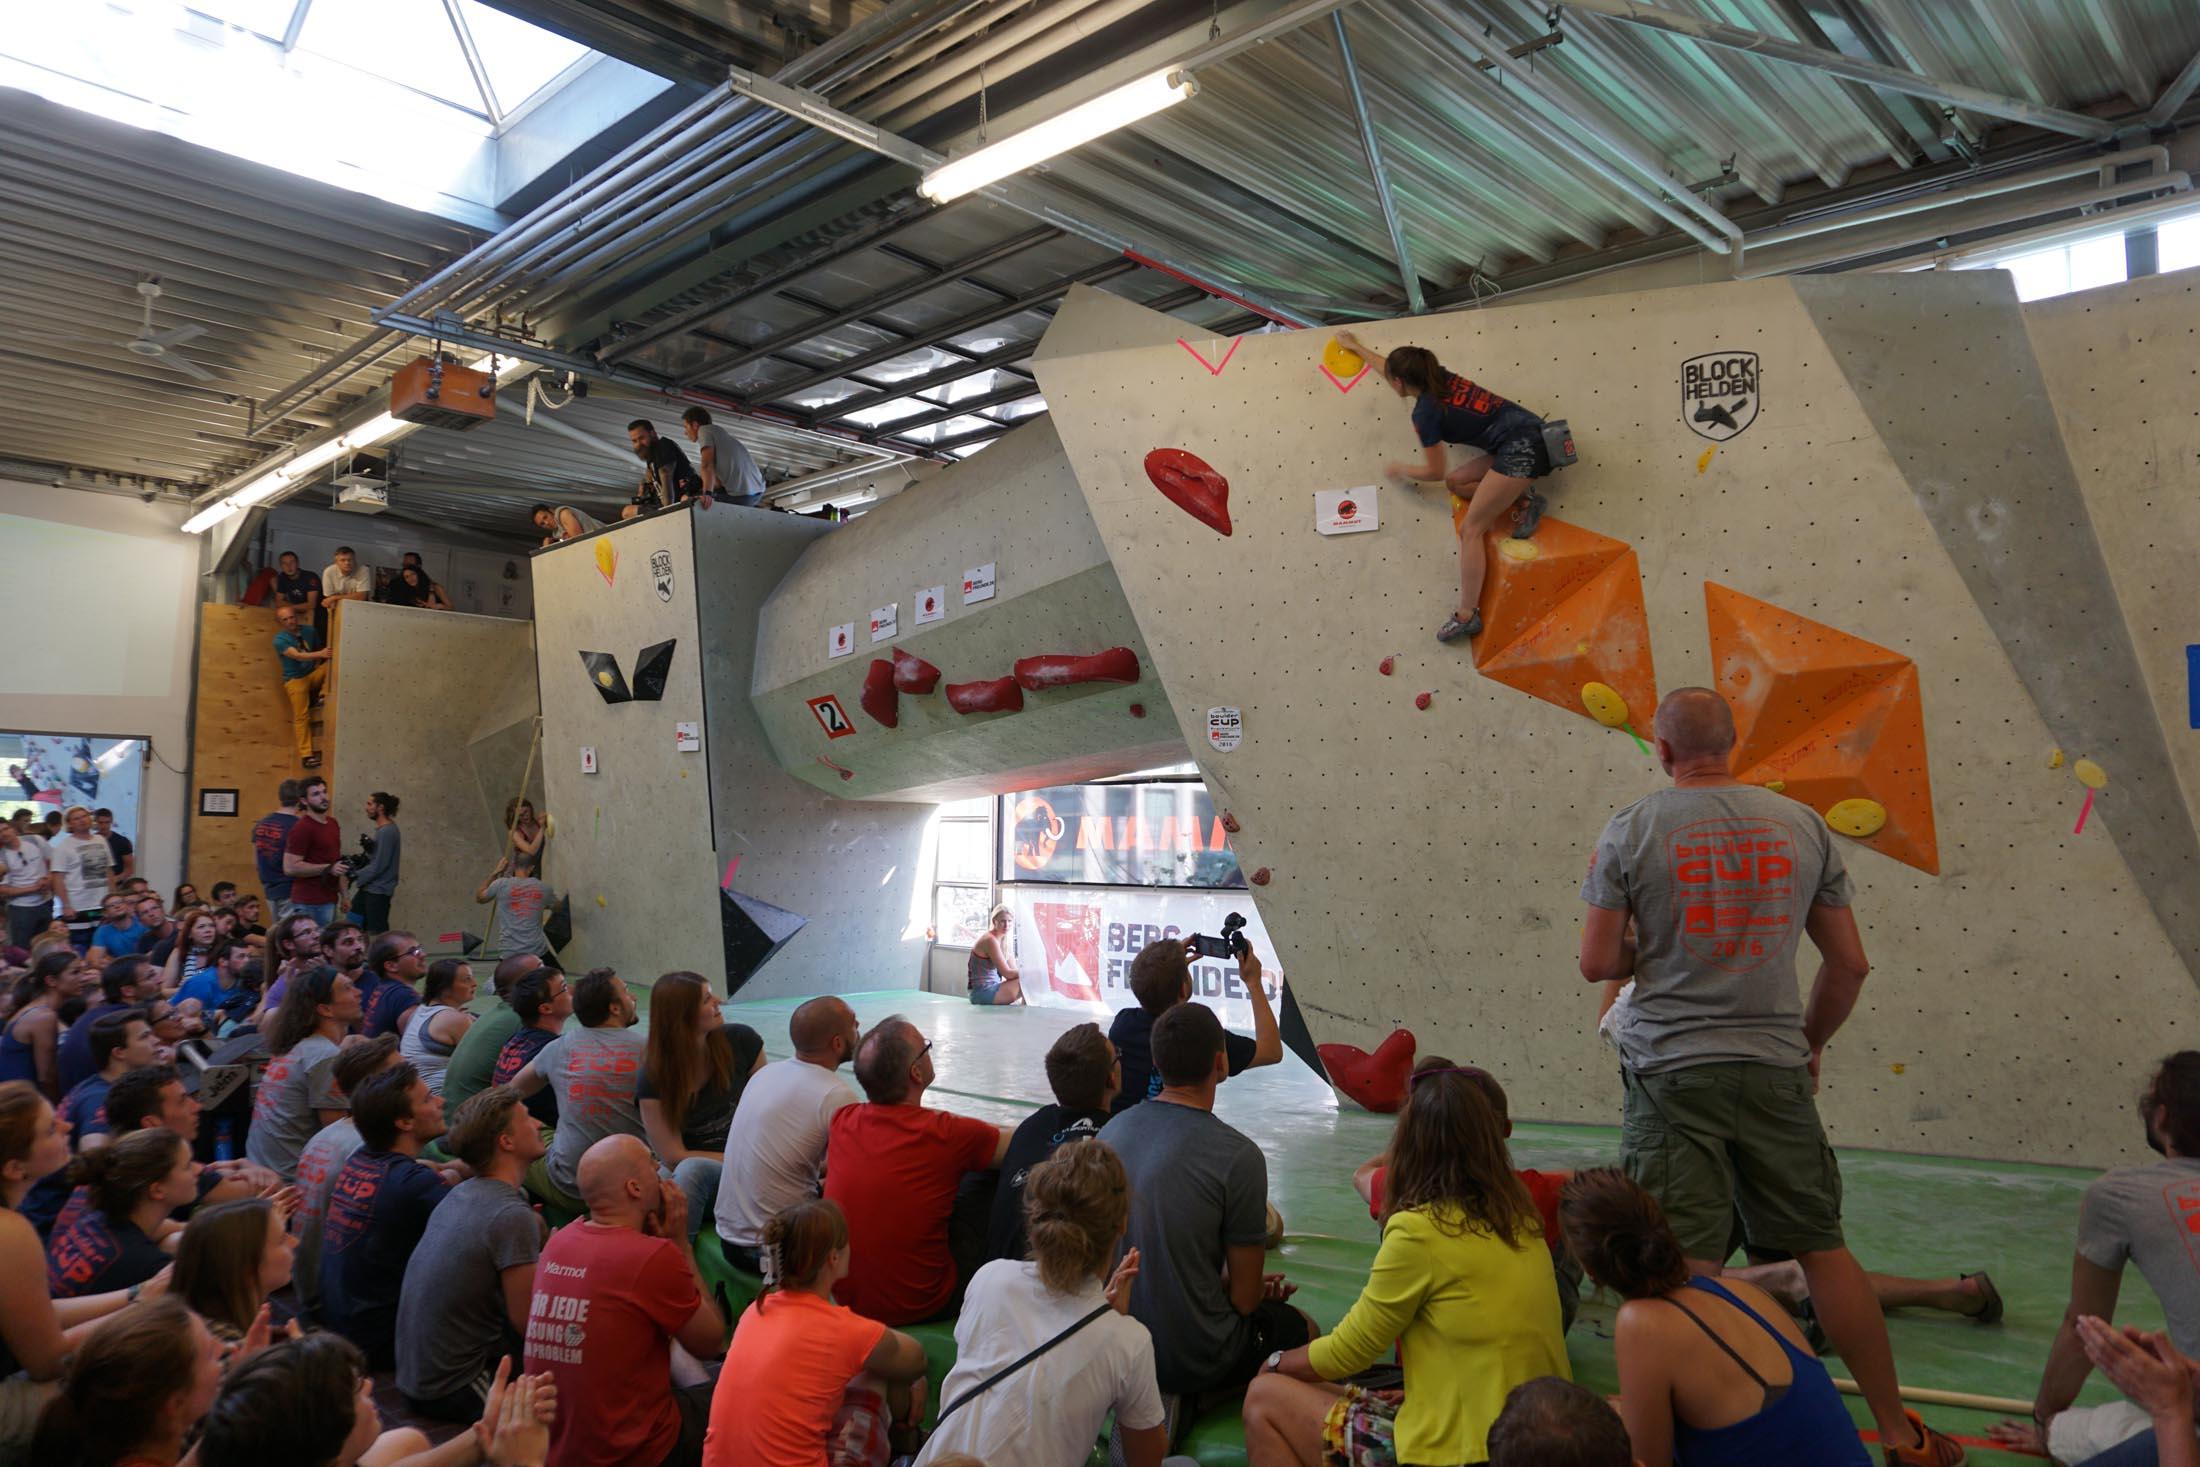 Finale, internationaler bouldercup Frankenjura 2016, BLOCKHELDEN Erlangen, Mammut, Bergfreunde.de, Boulderwettkampf07092016567